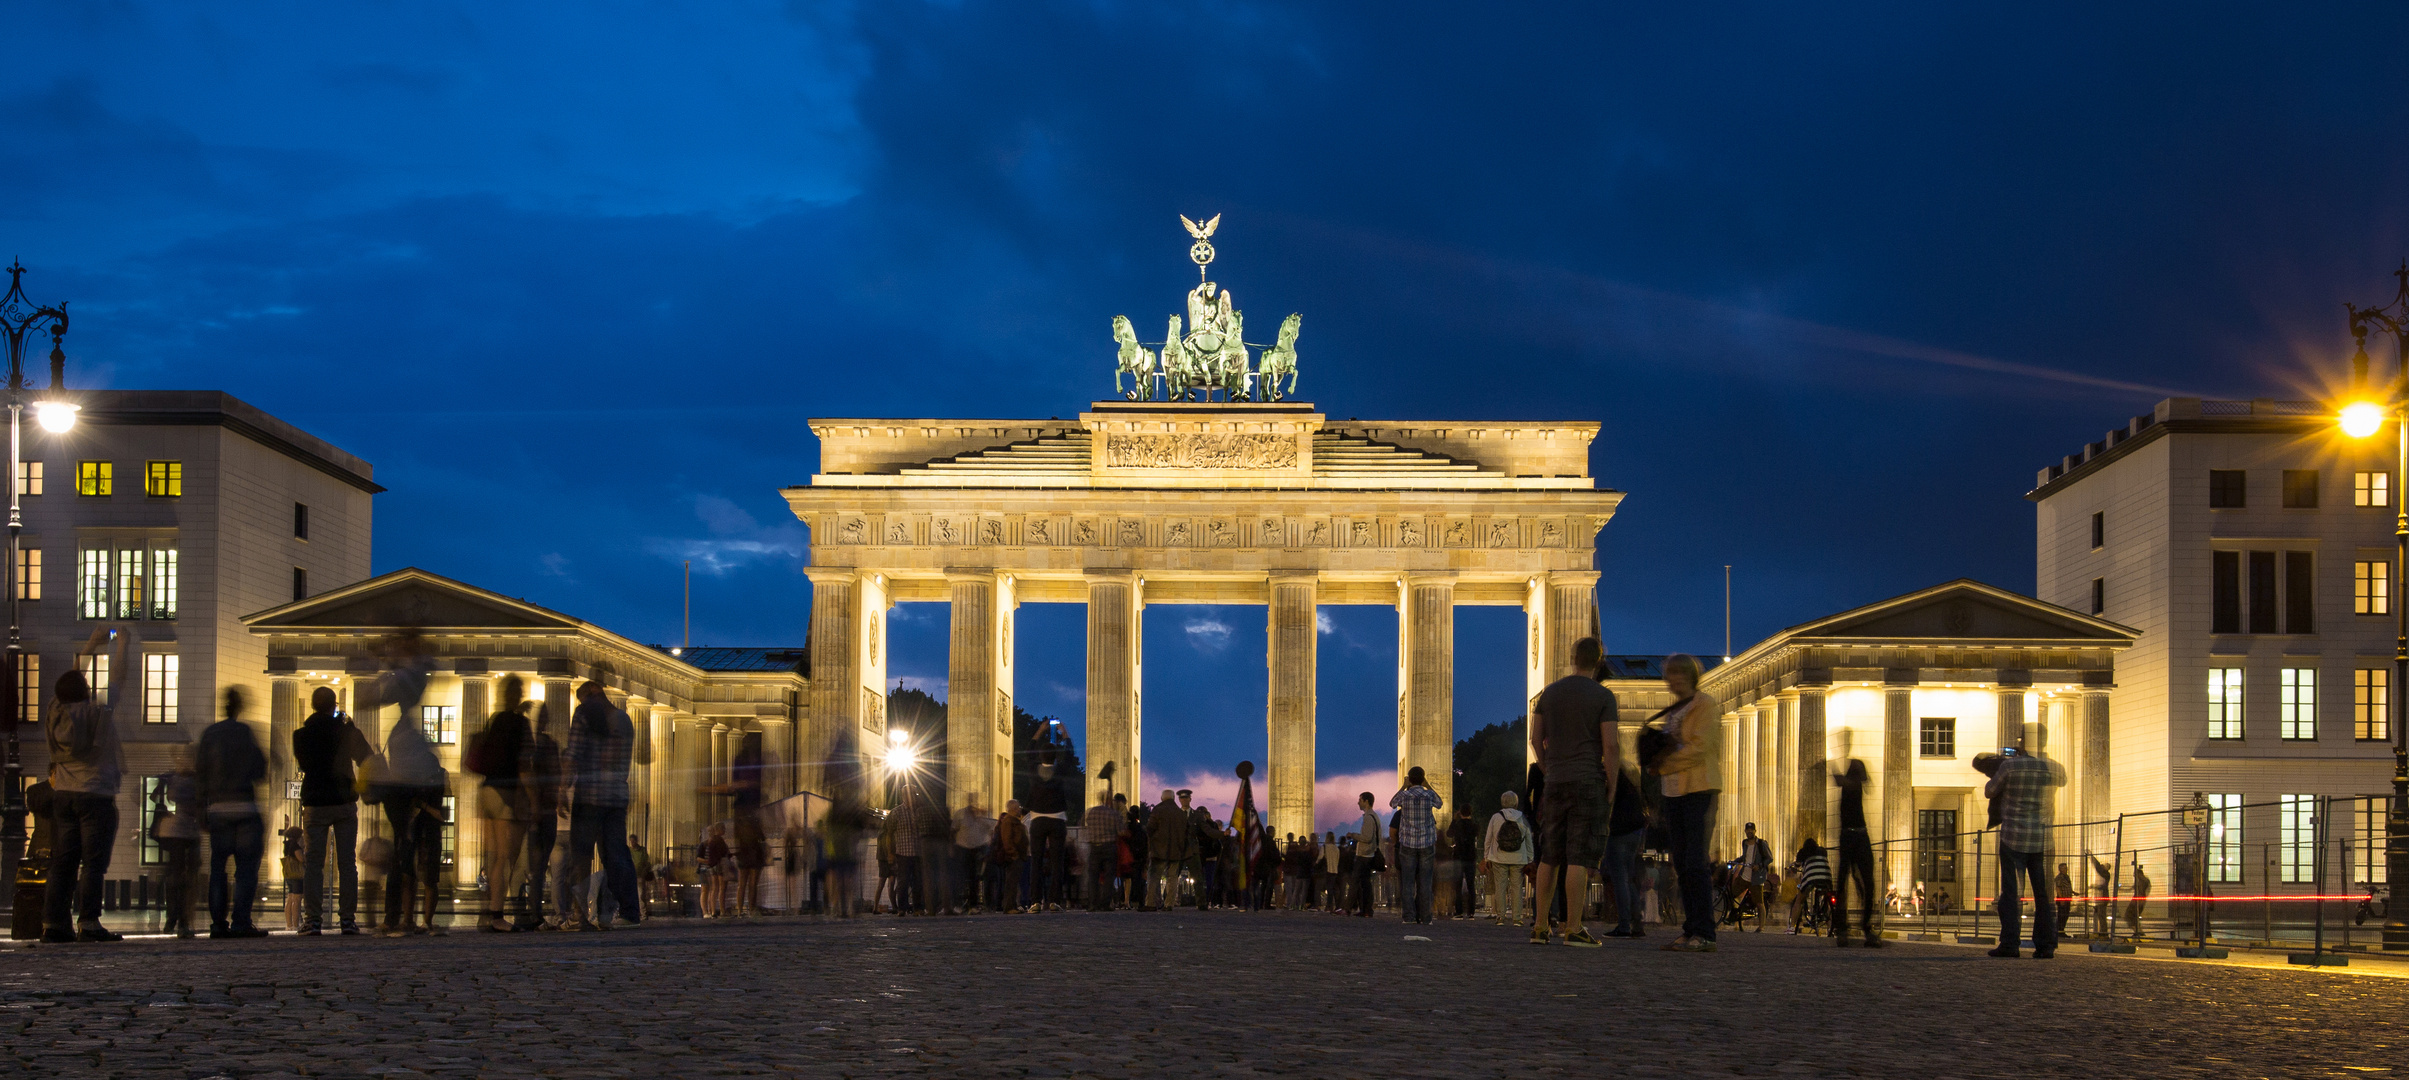 Brandenburger Tor am Abend